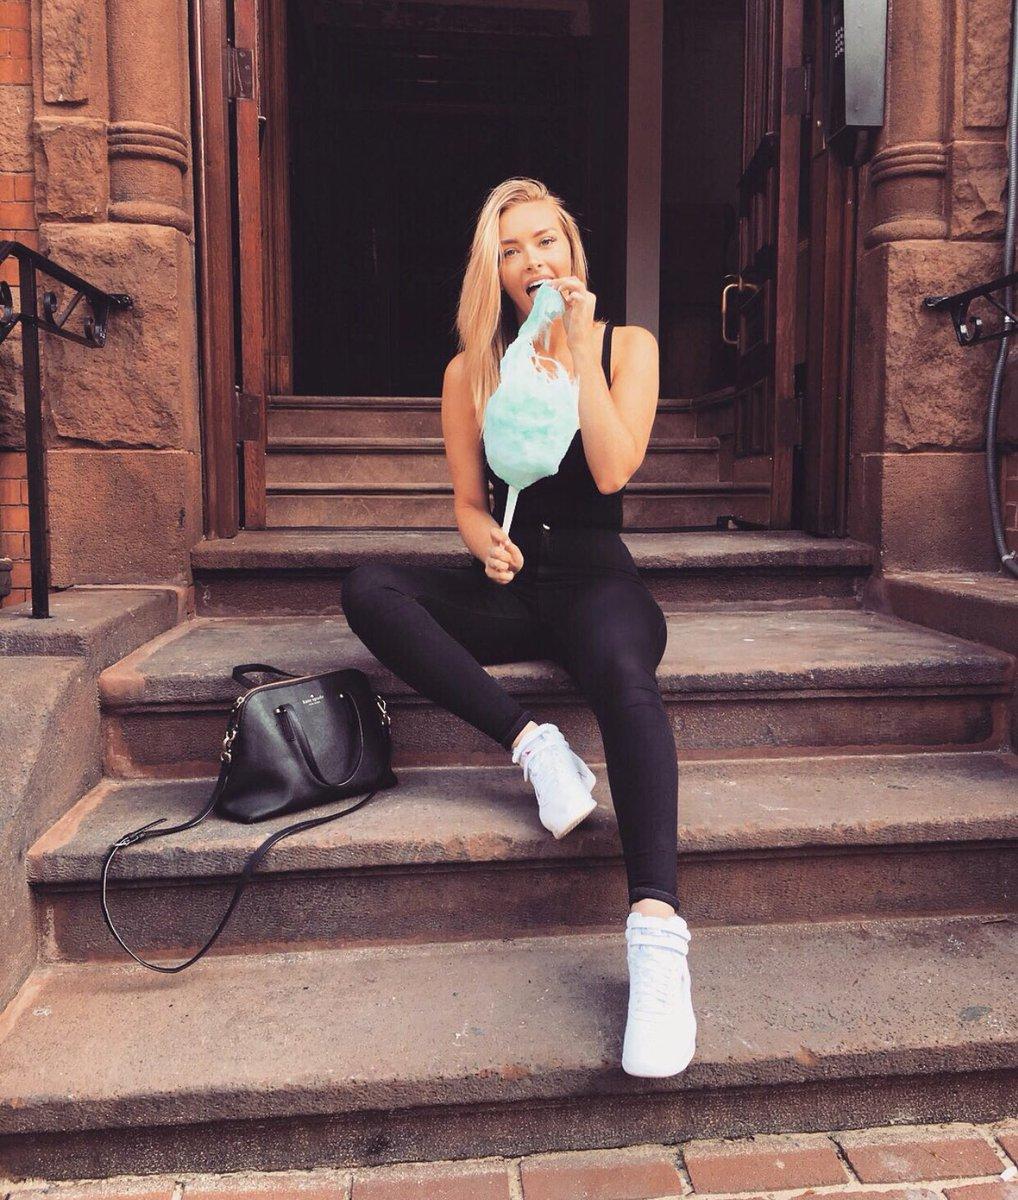 "Camille Kostek: Camille Kostek On Twitter: ""my Kind Of Sunday Funday ☺️🦄🍭"